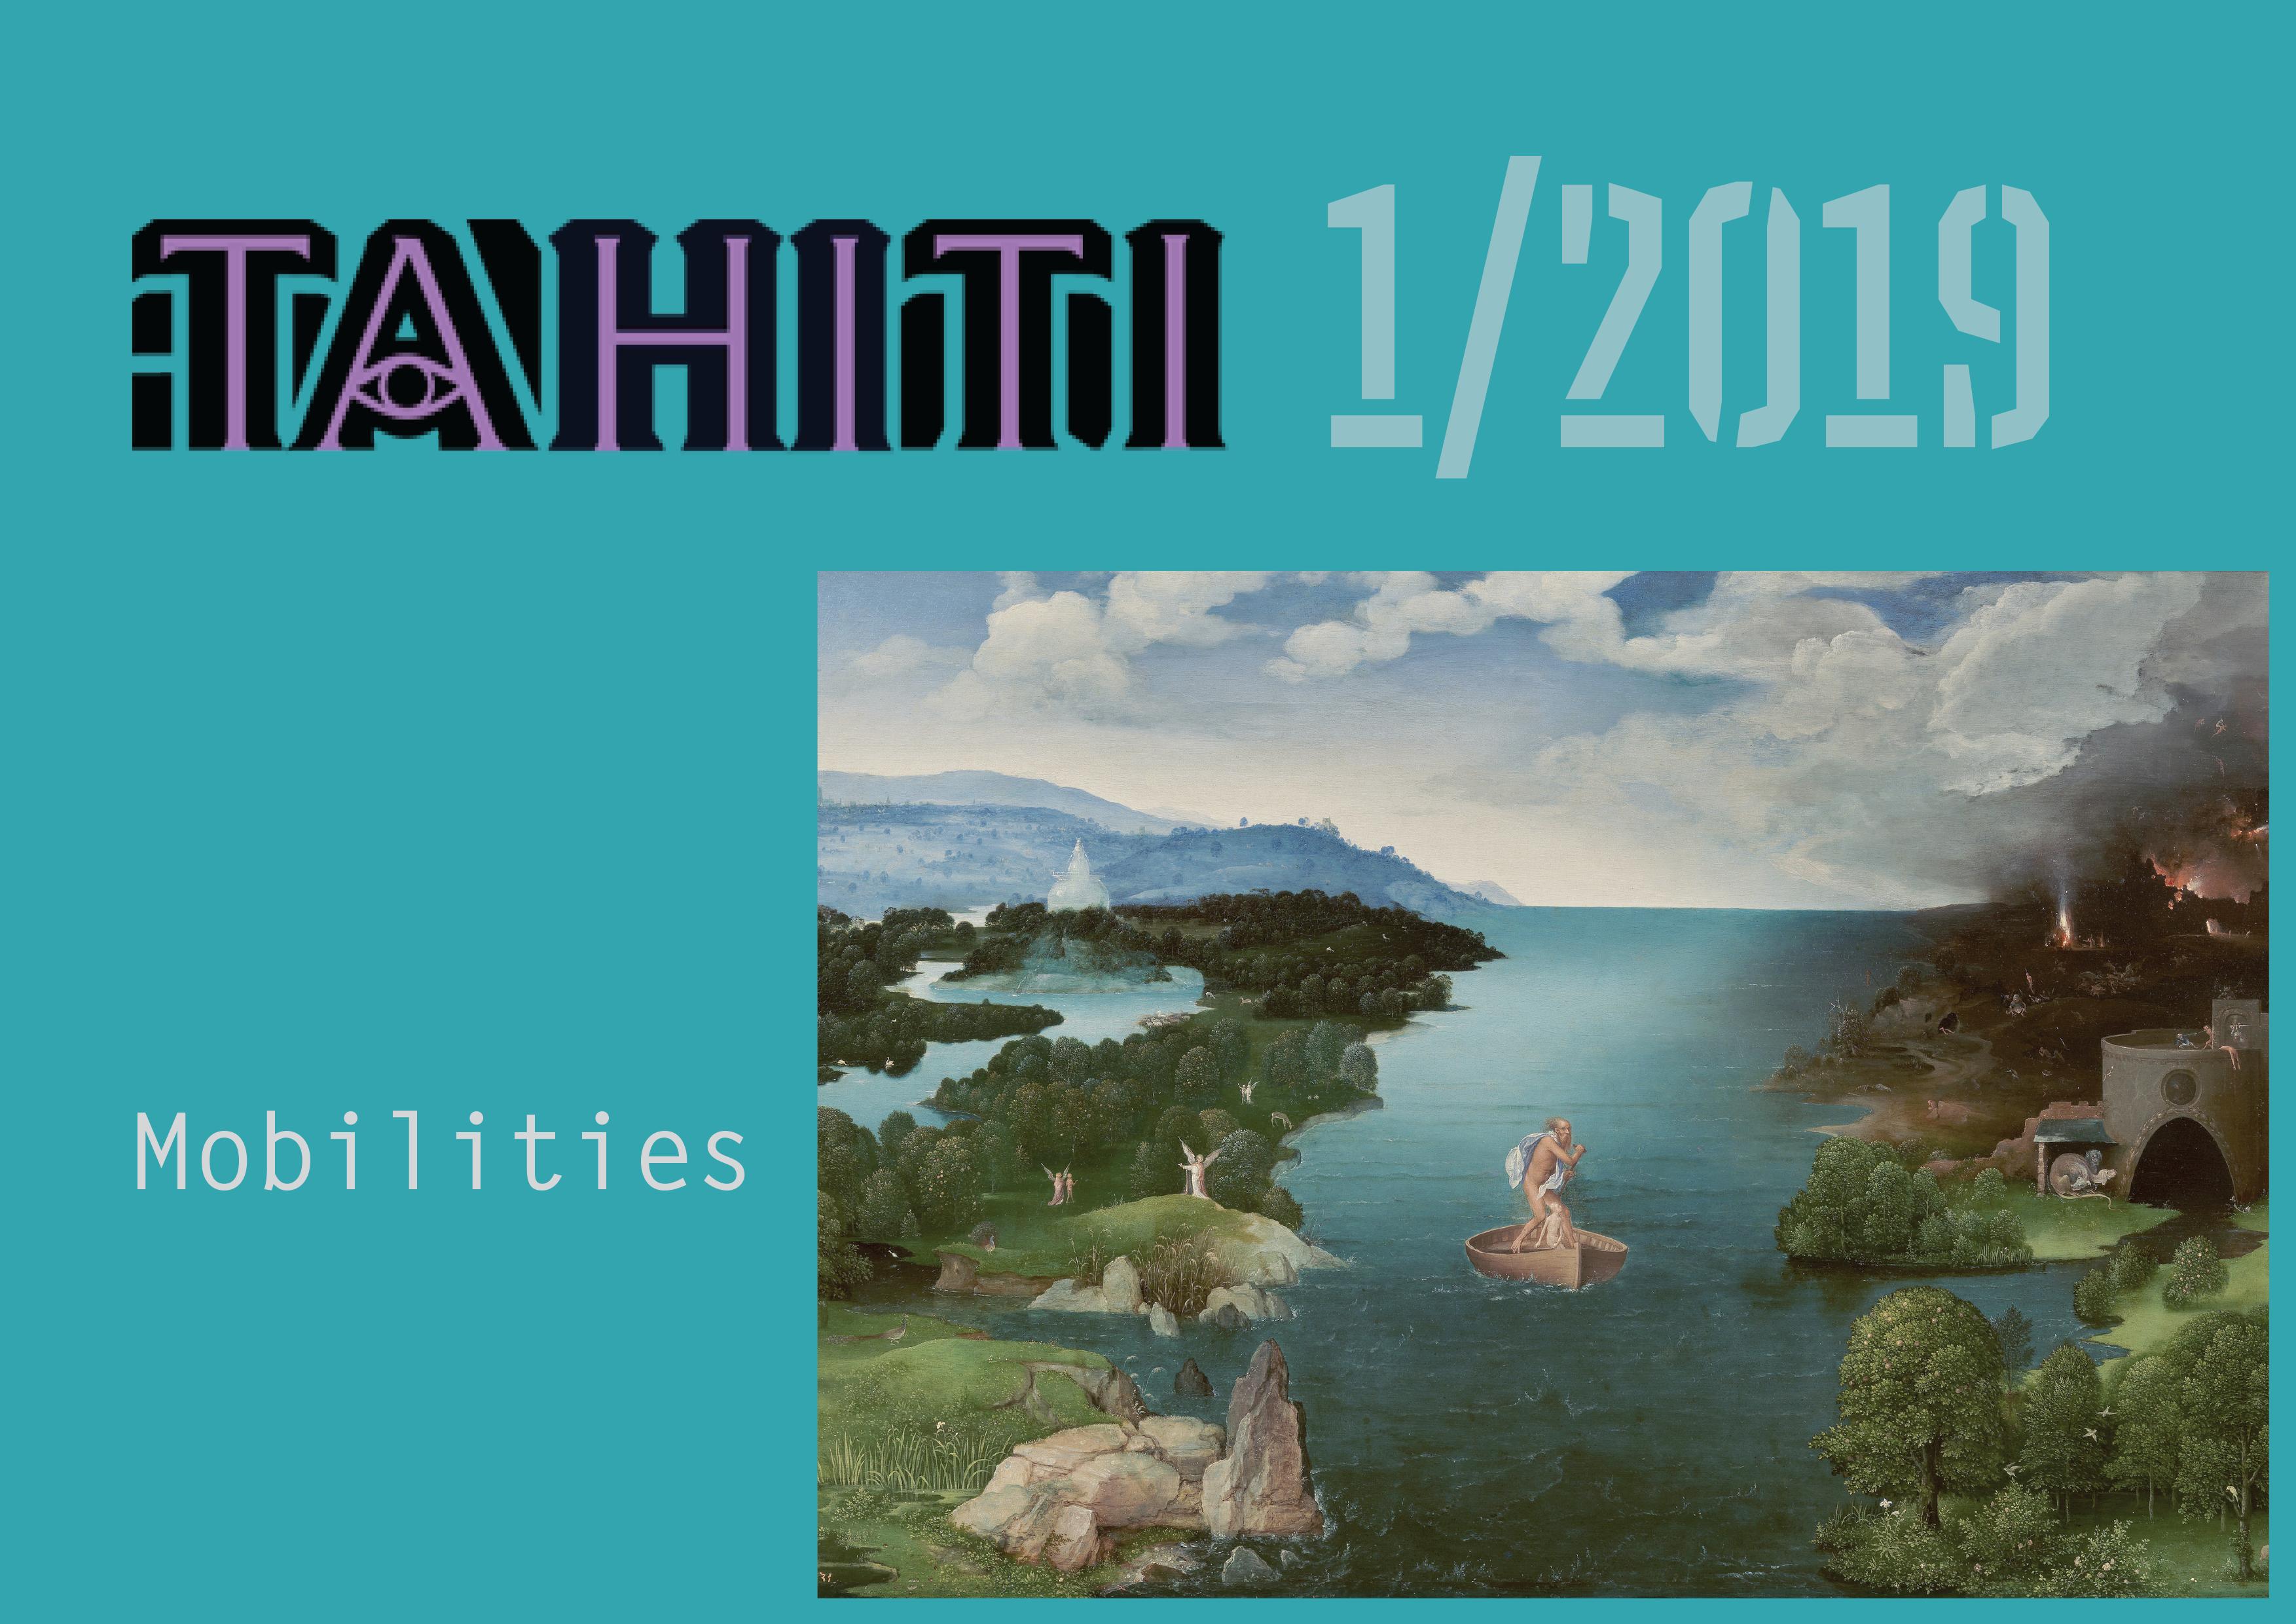 Vol 9 Nro 1 (2019): Mobilities